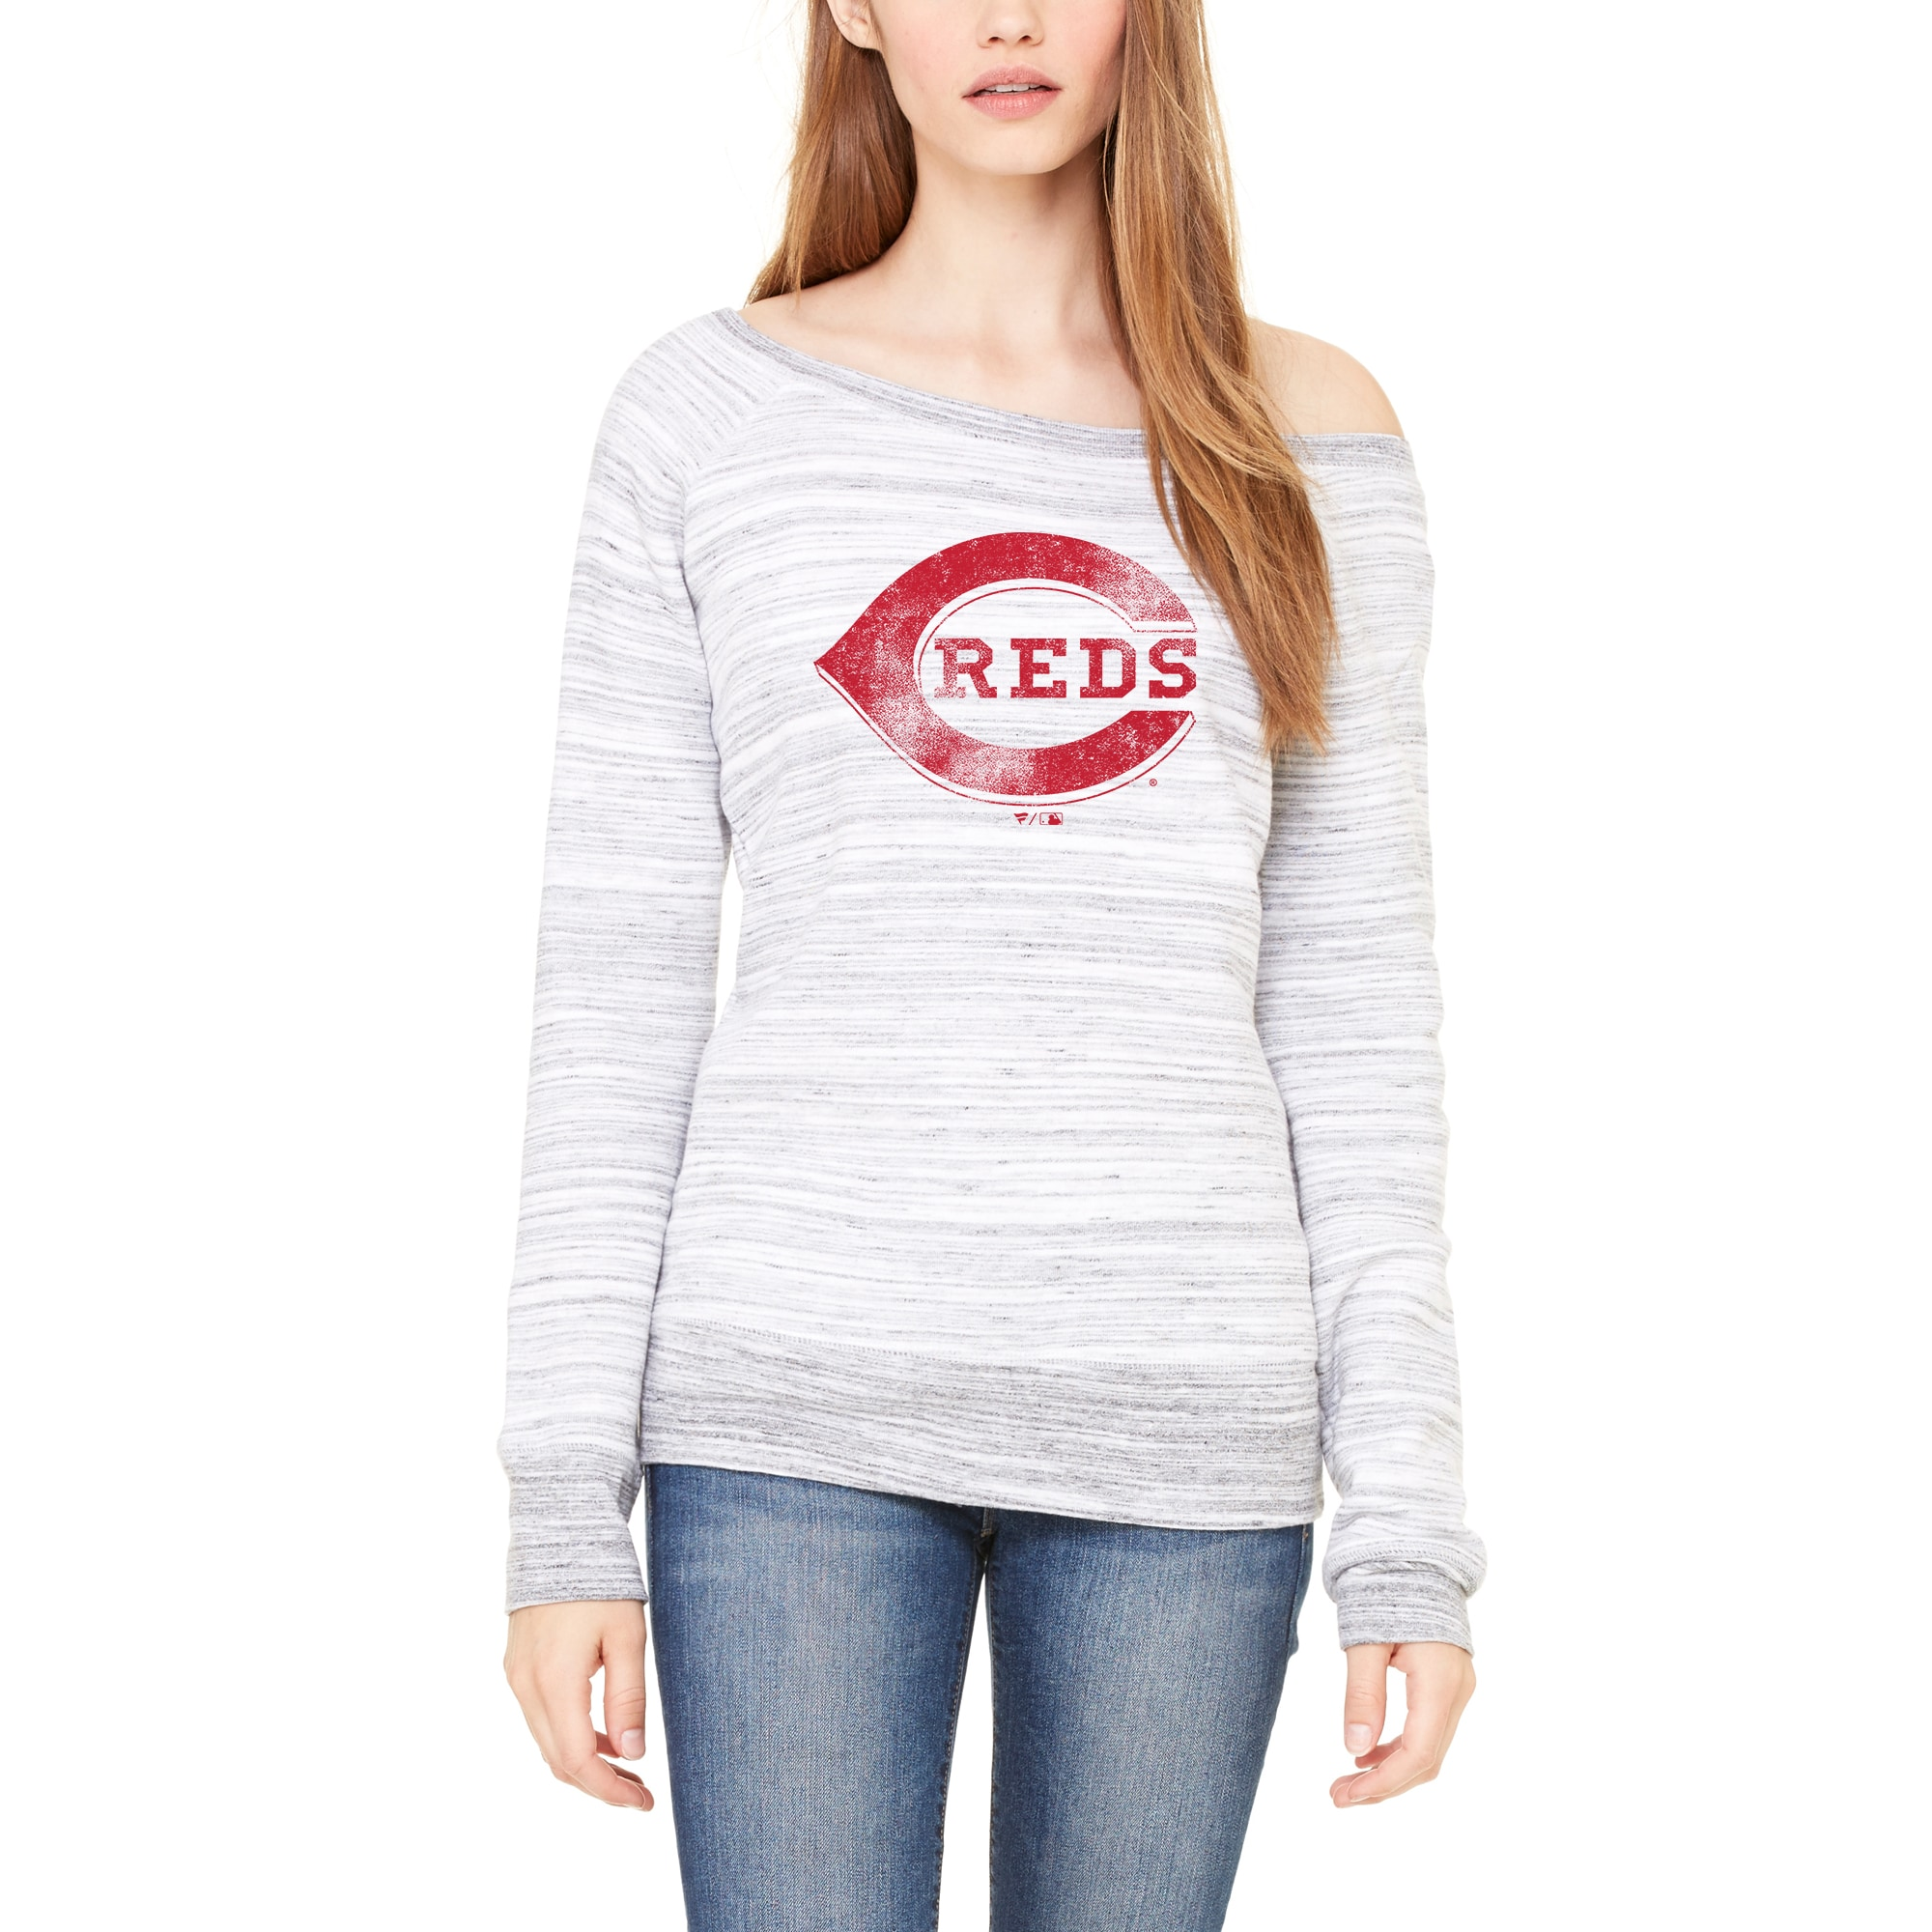 Cincinnati Reds Let Loose by RNL Women's Game Day Wide Neck Sweatshirt - Light Gray Marble